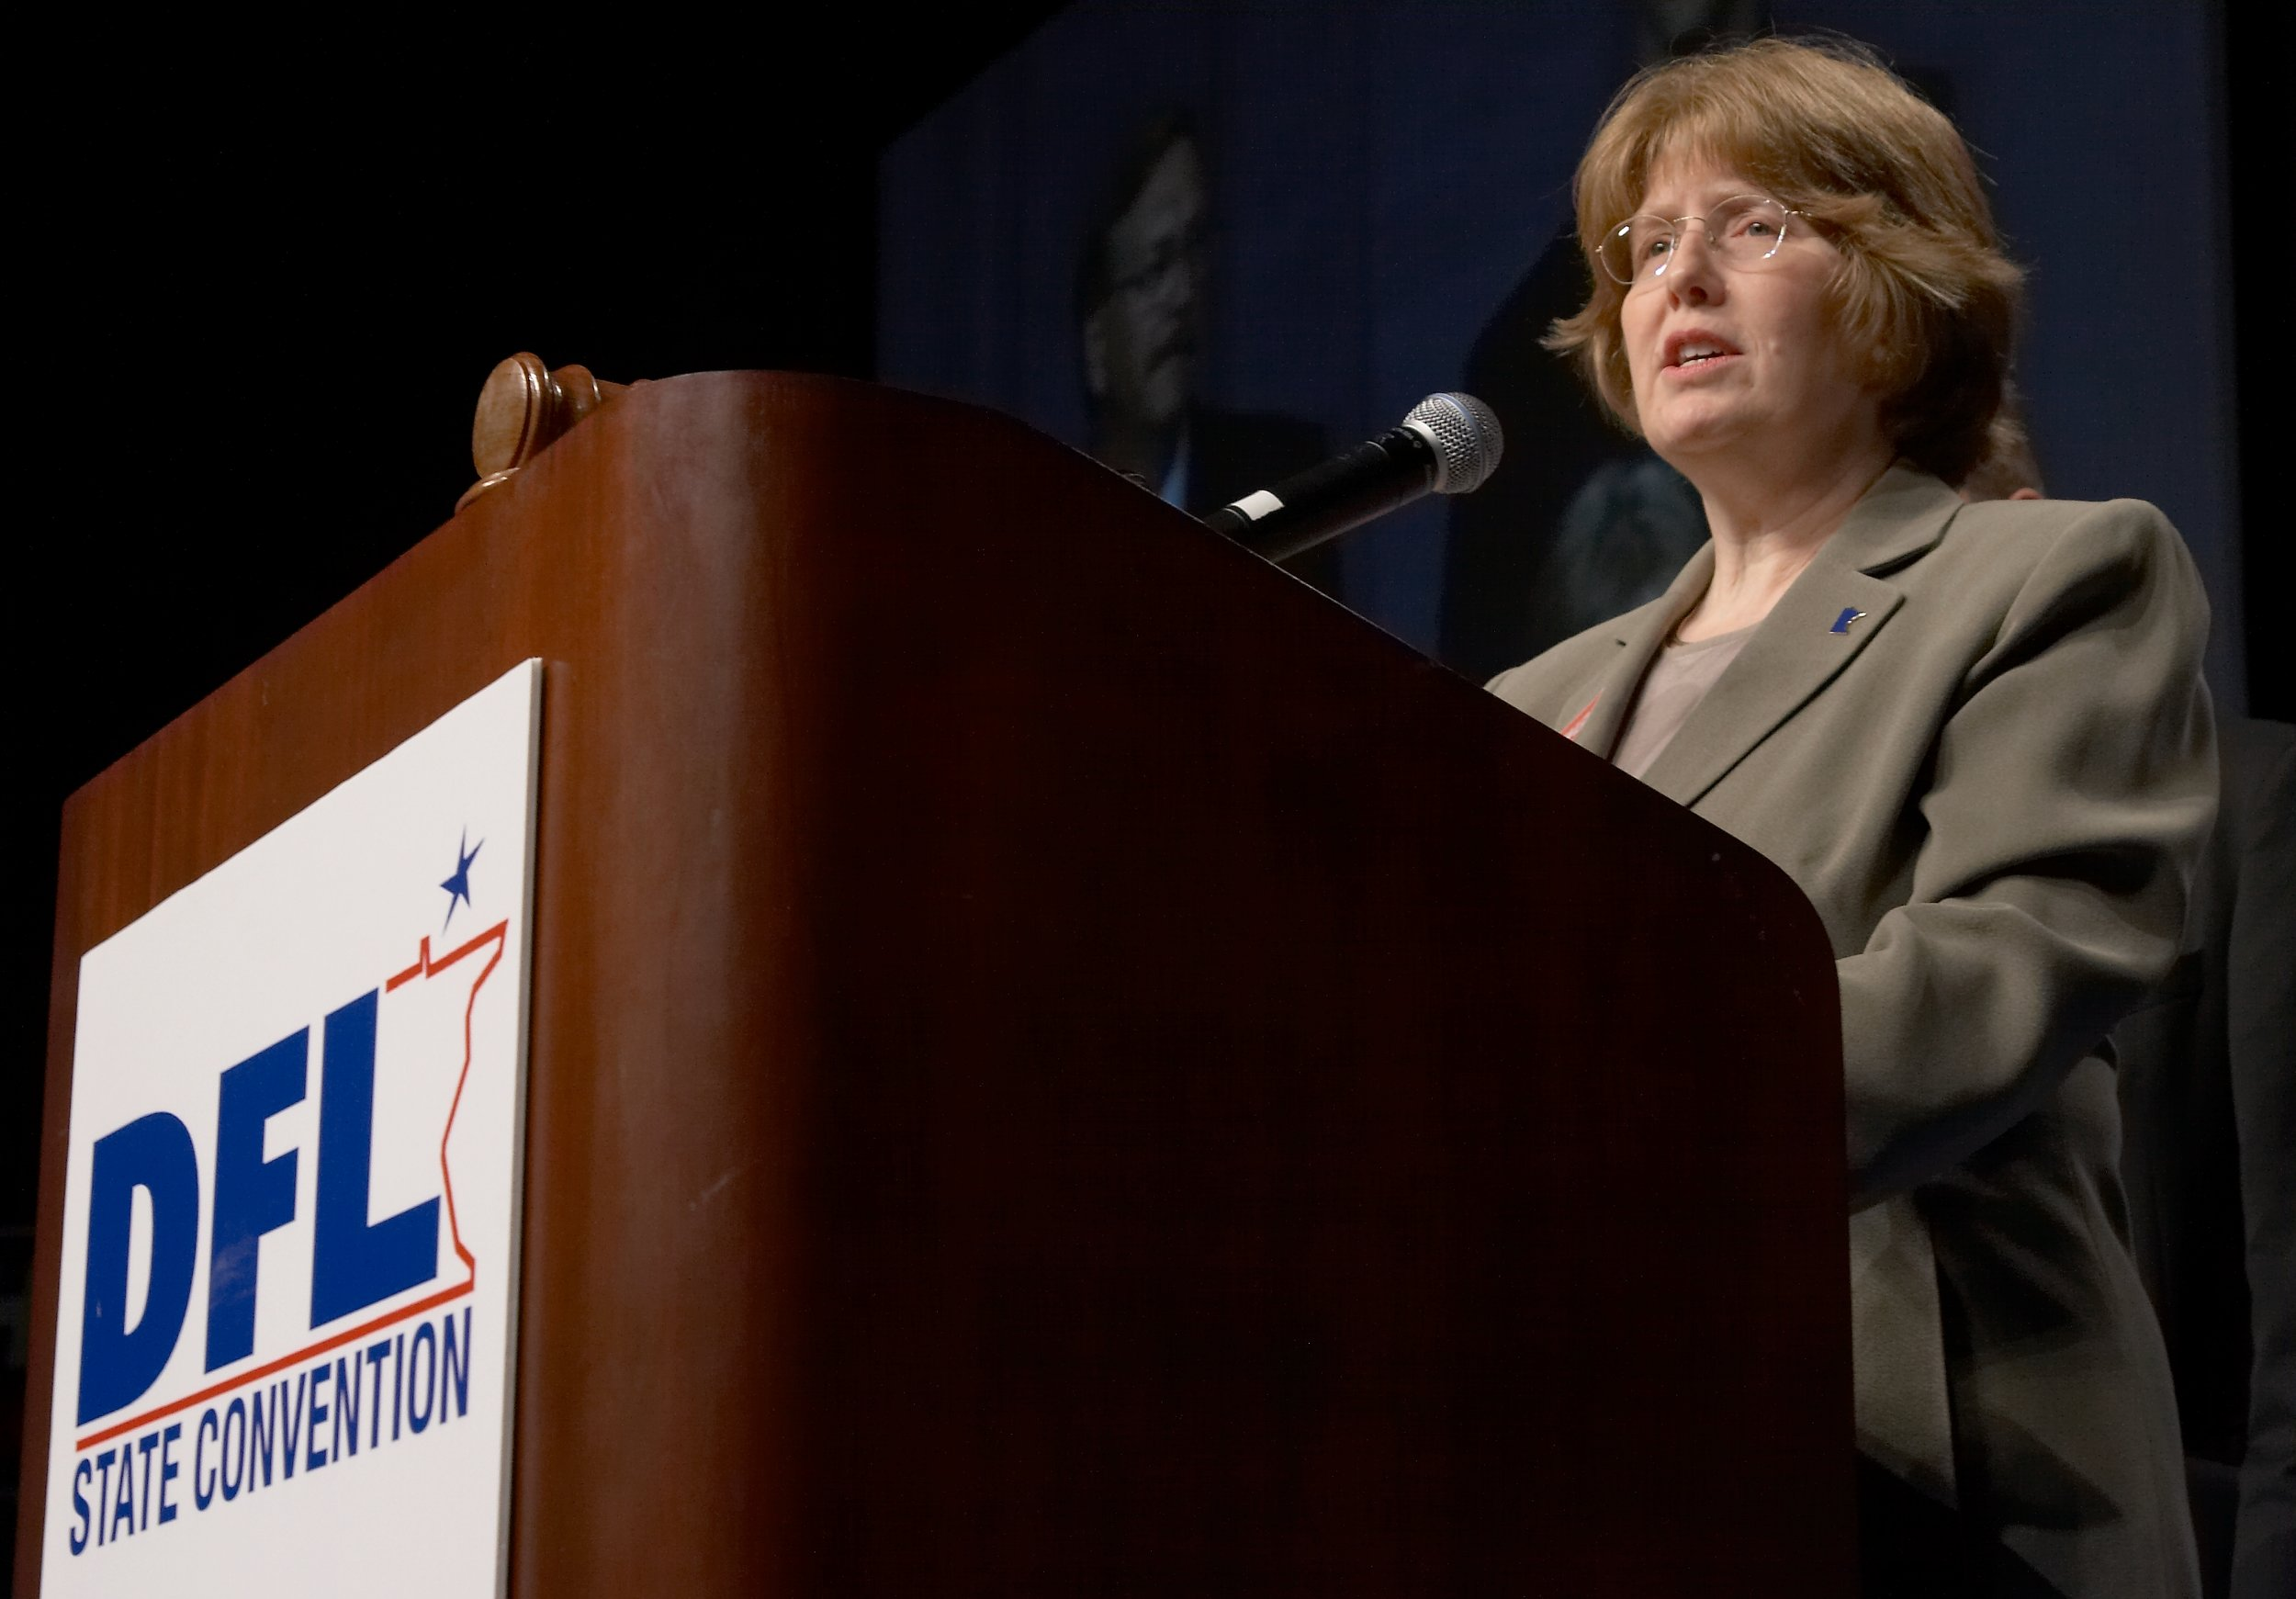 Speaking at DFL convention06.jpg